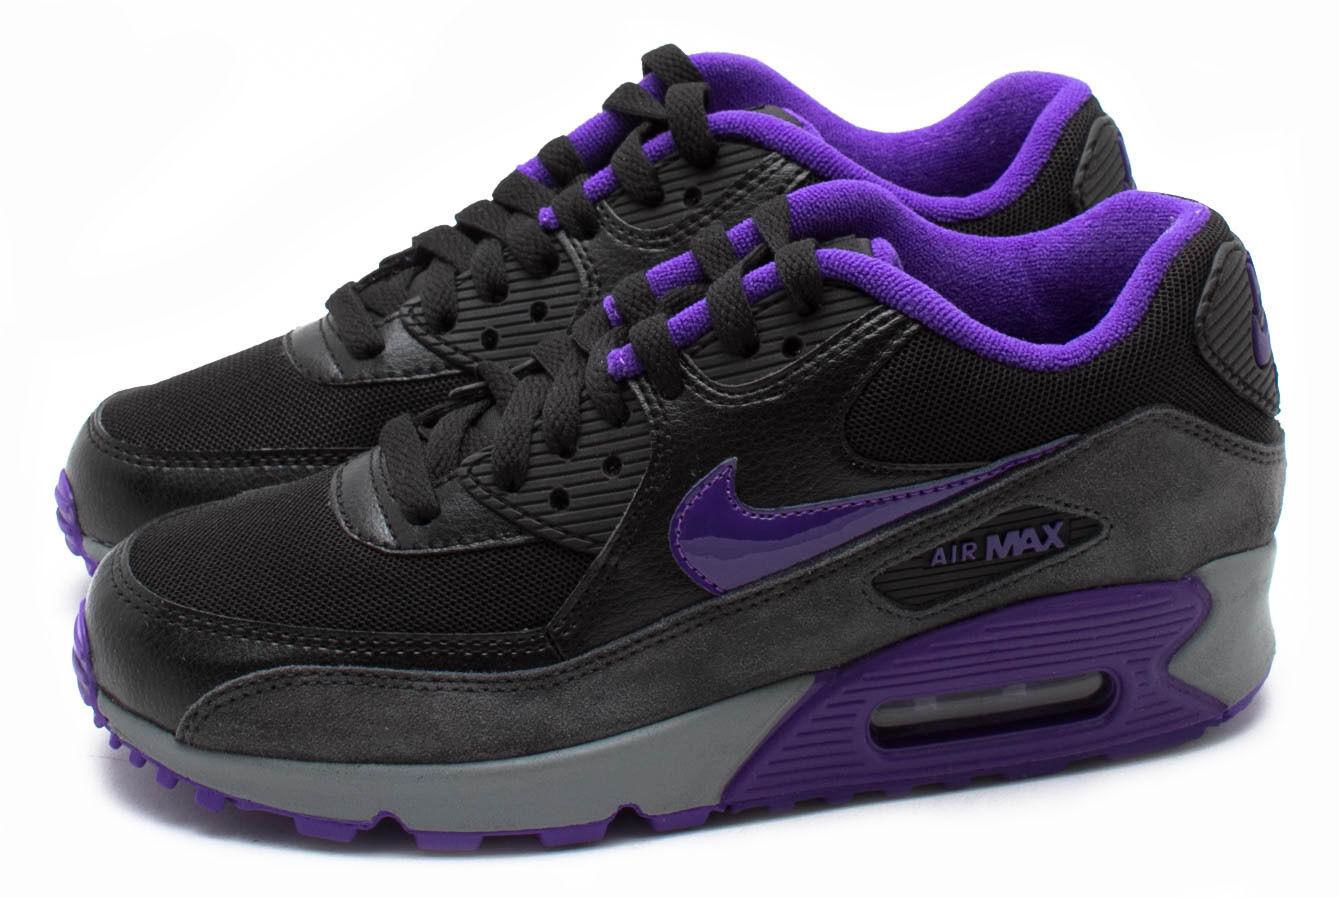 Nike WMNS Air Max 90 Black/Hyper Grape/Anthracite 616730-010 Sz 5 5.5 7 8